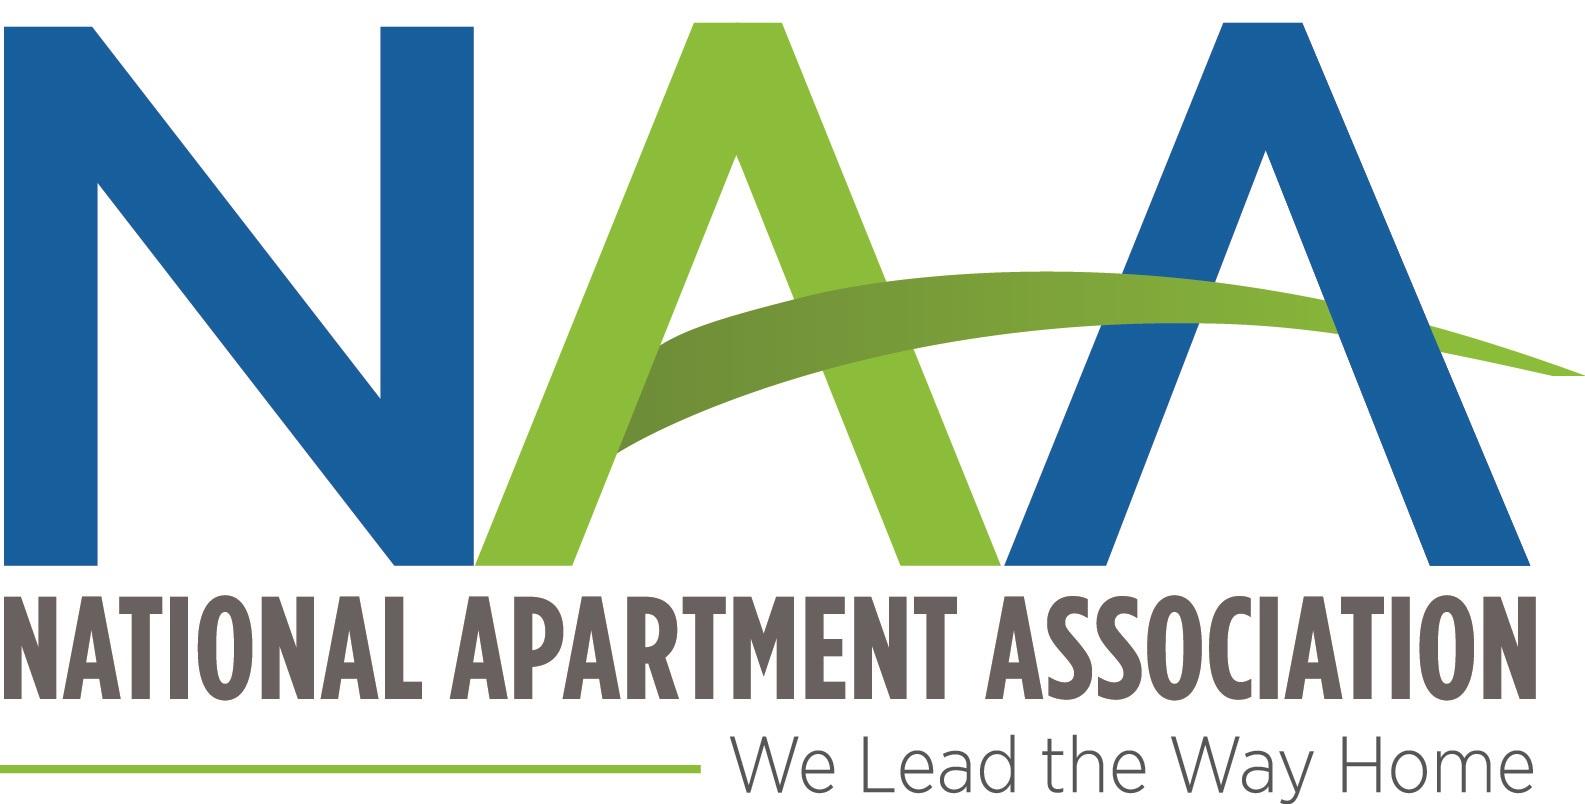 Education Atlanta Apartment Association